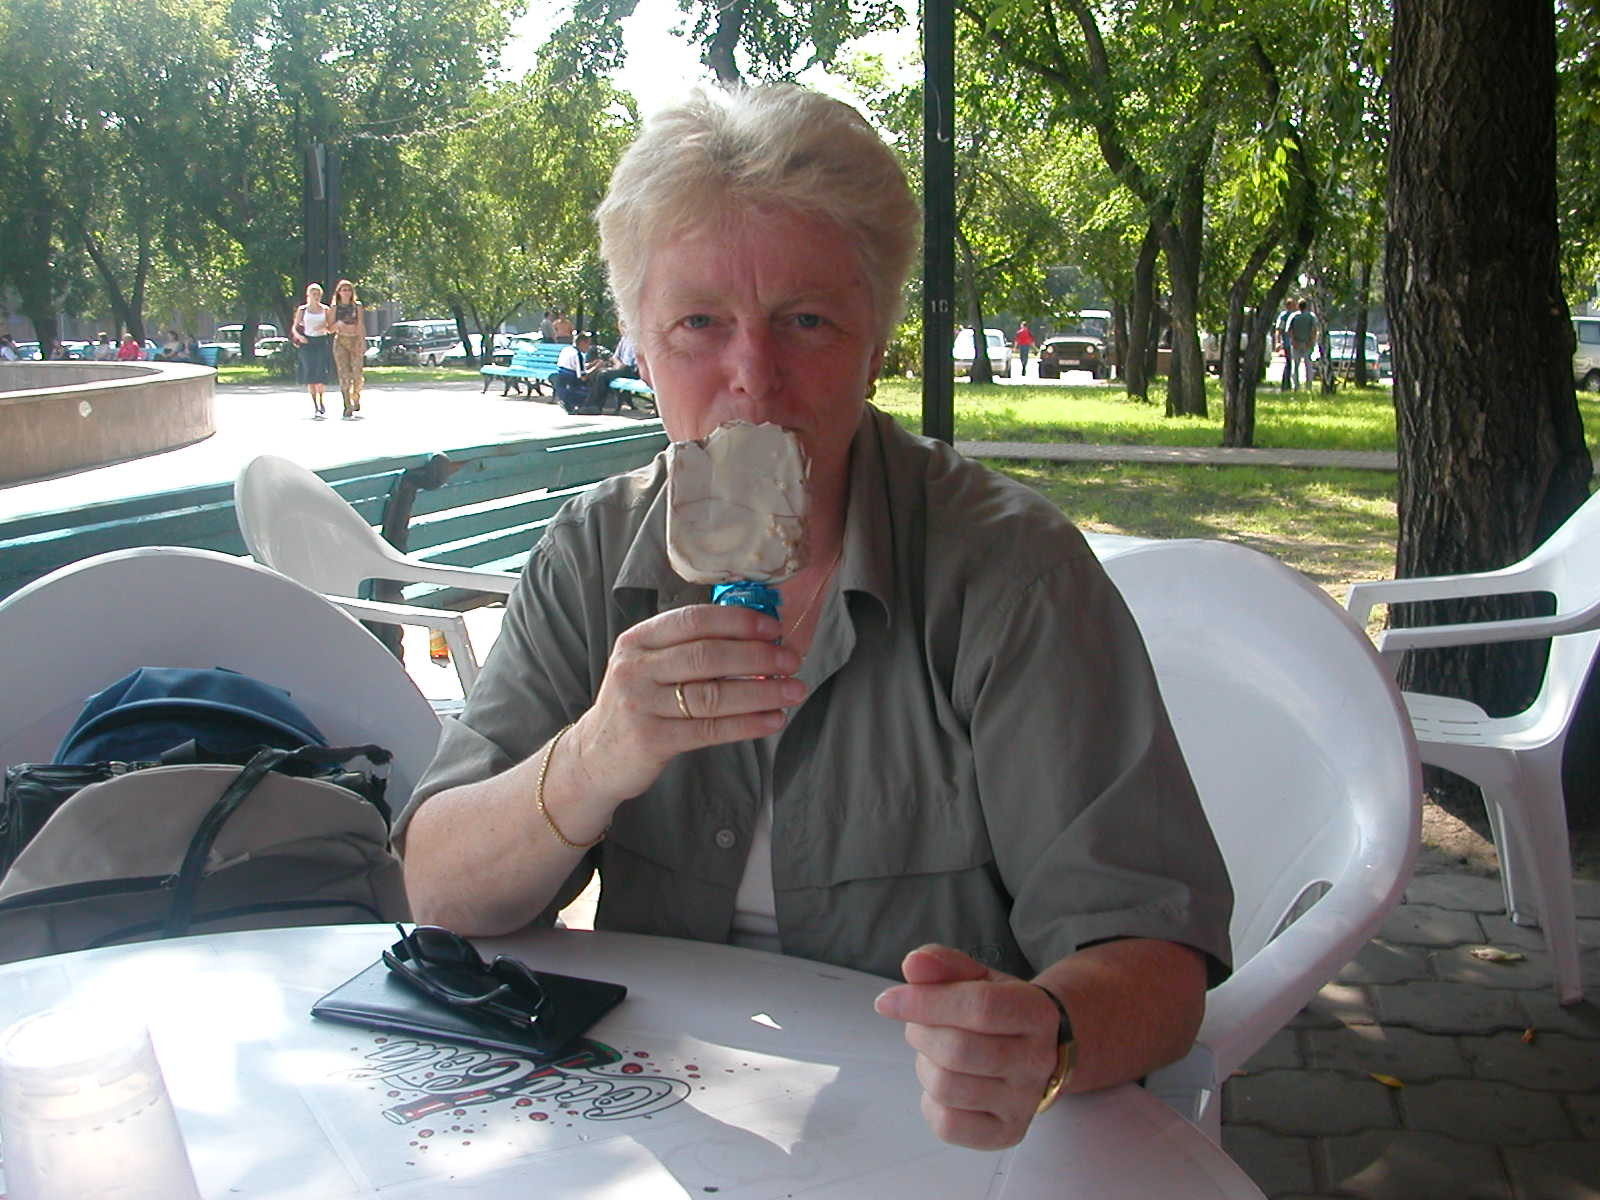 ... schmeckt immer, sowohl in Iserlohn, als auch in Omsk